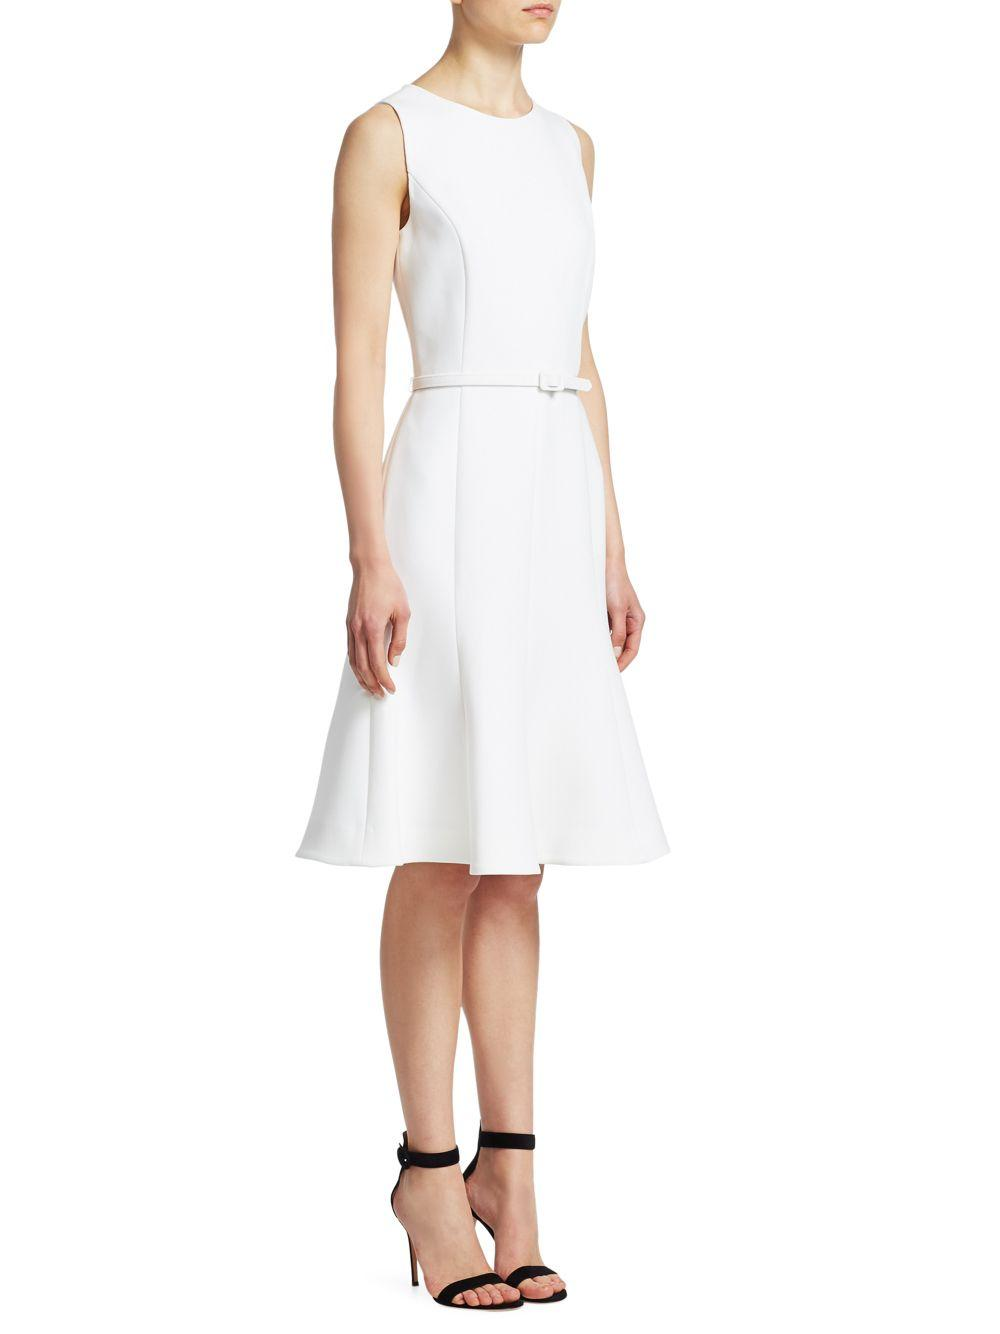 4e12950d9dd Lyst - Oscar de la Renta Crepe A-line Day Dress in White - Save 15%